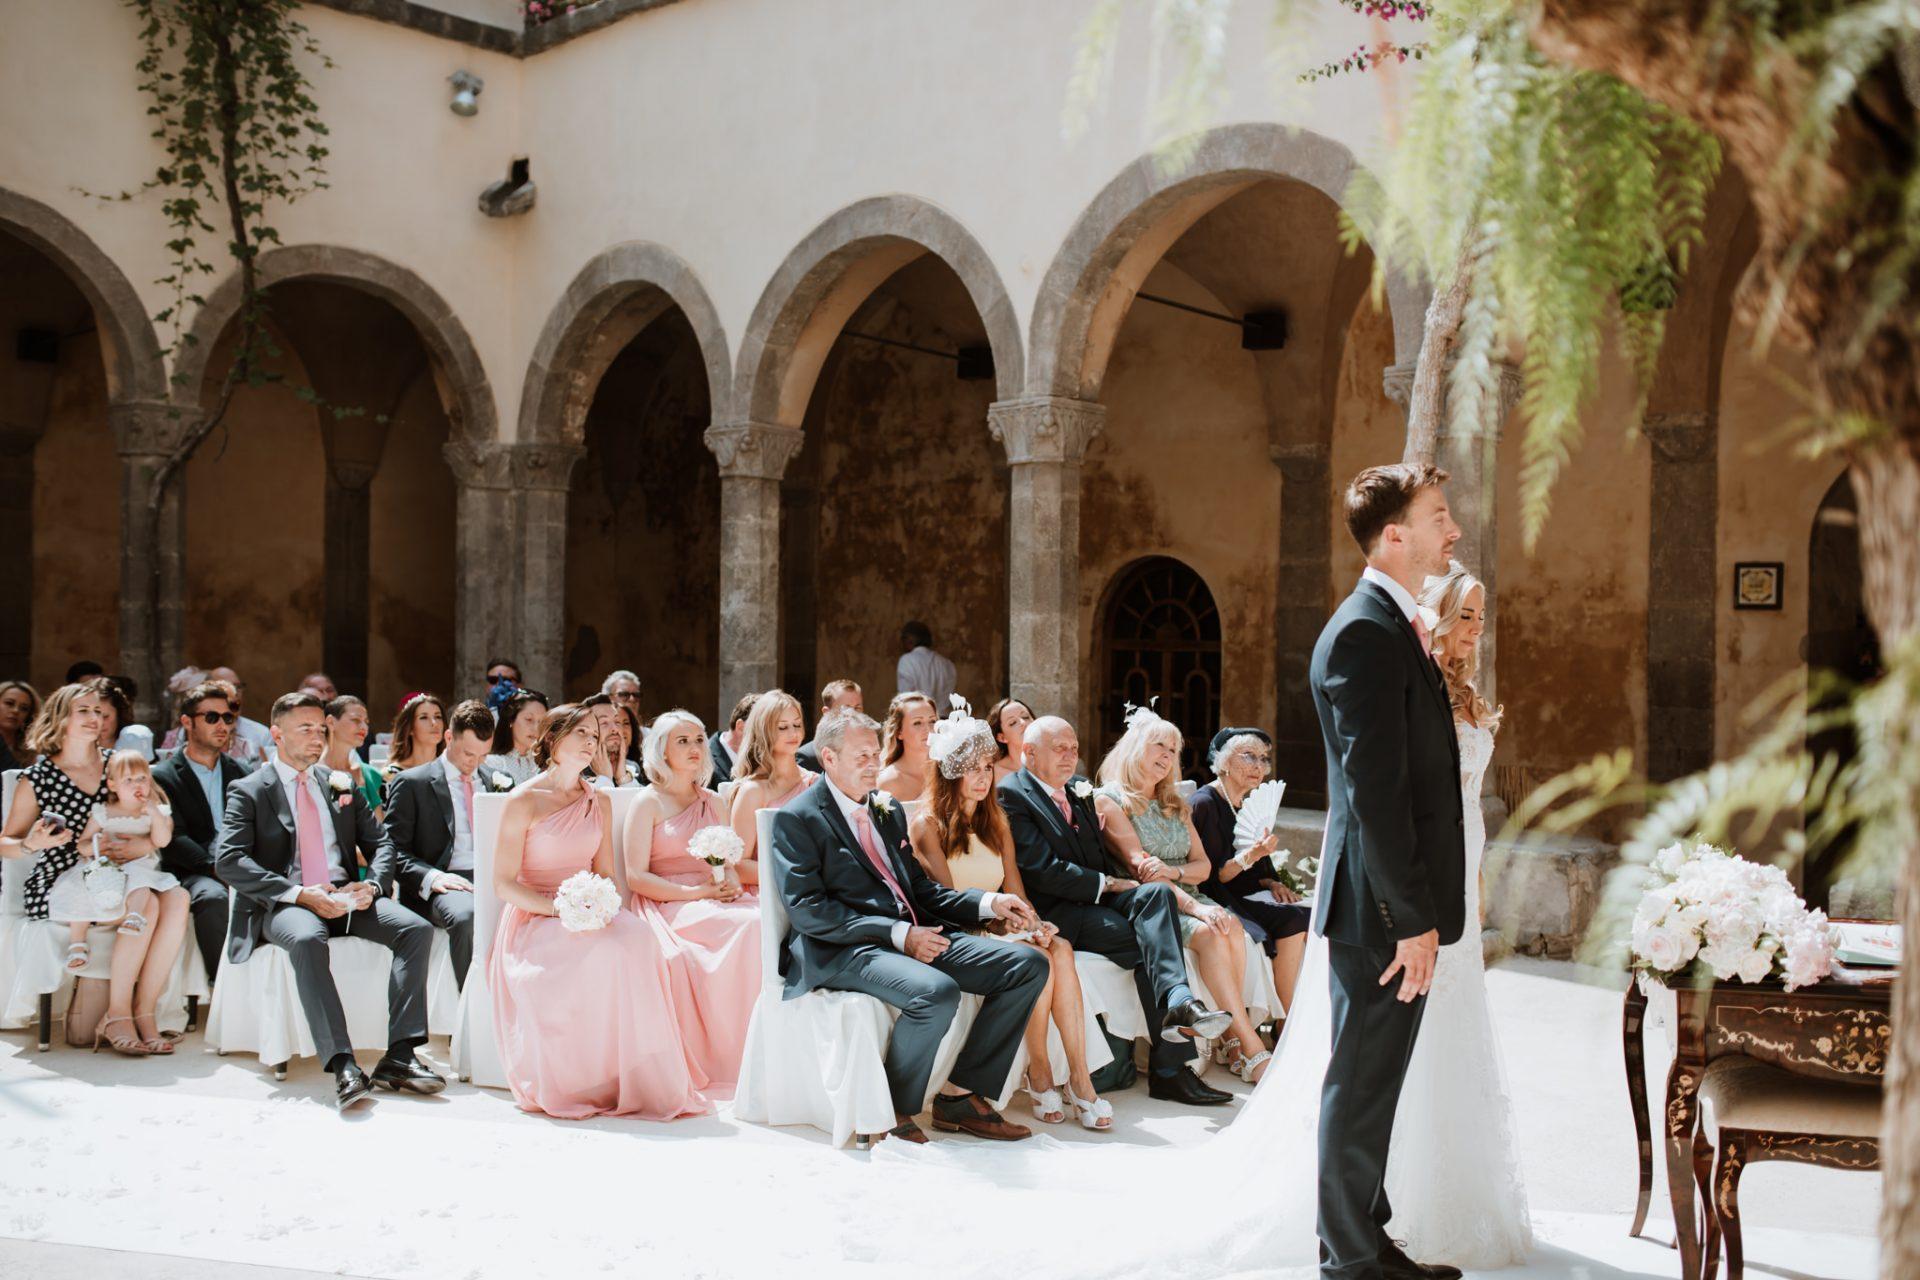 bride and groom wedding ceremony sorrento cloisters chiostro di san francesco